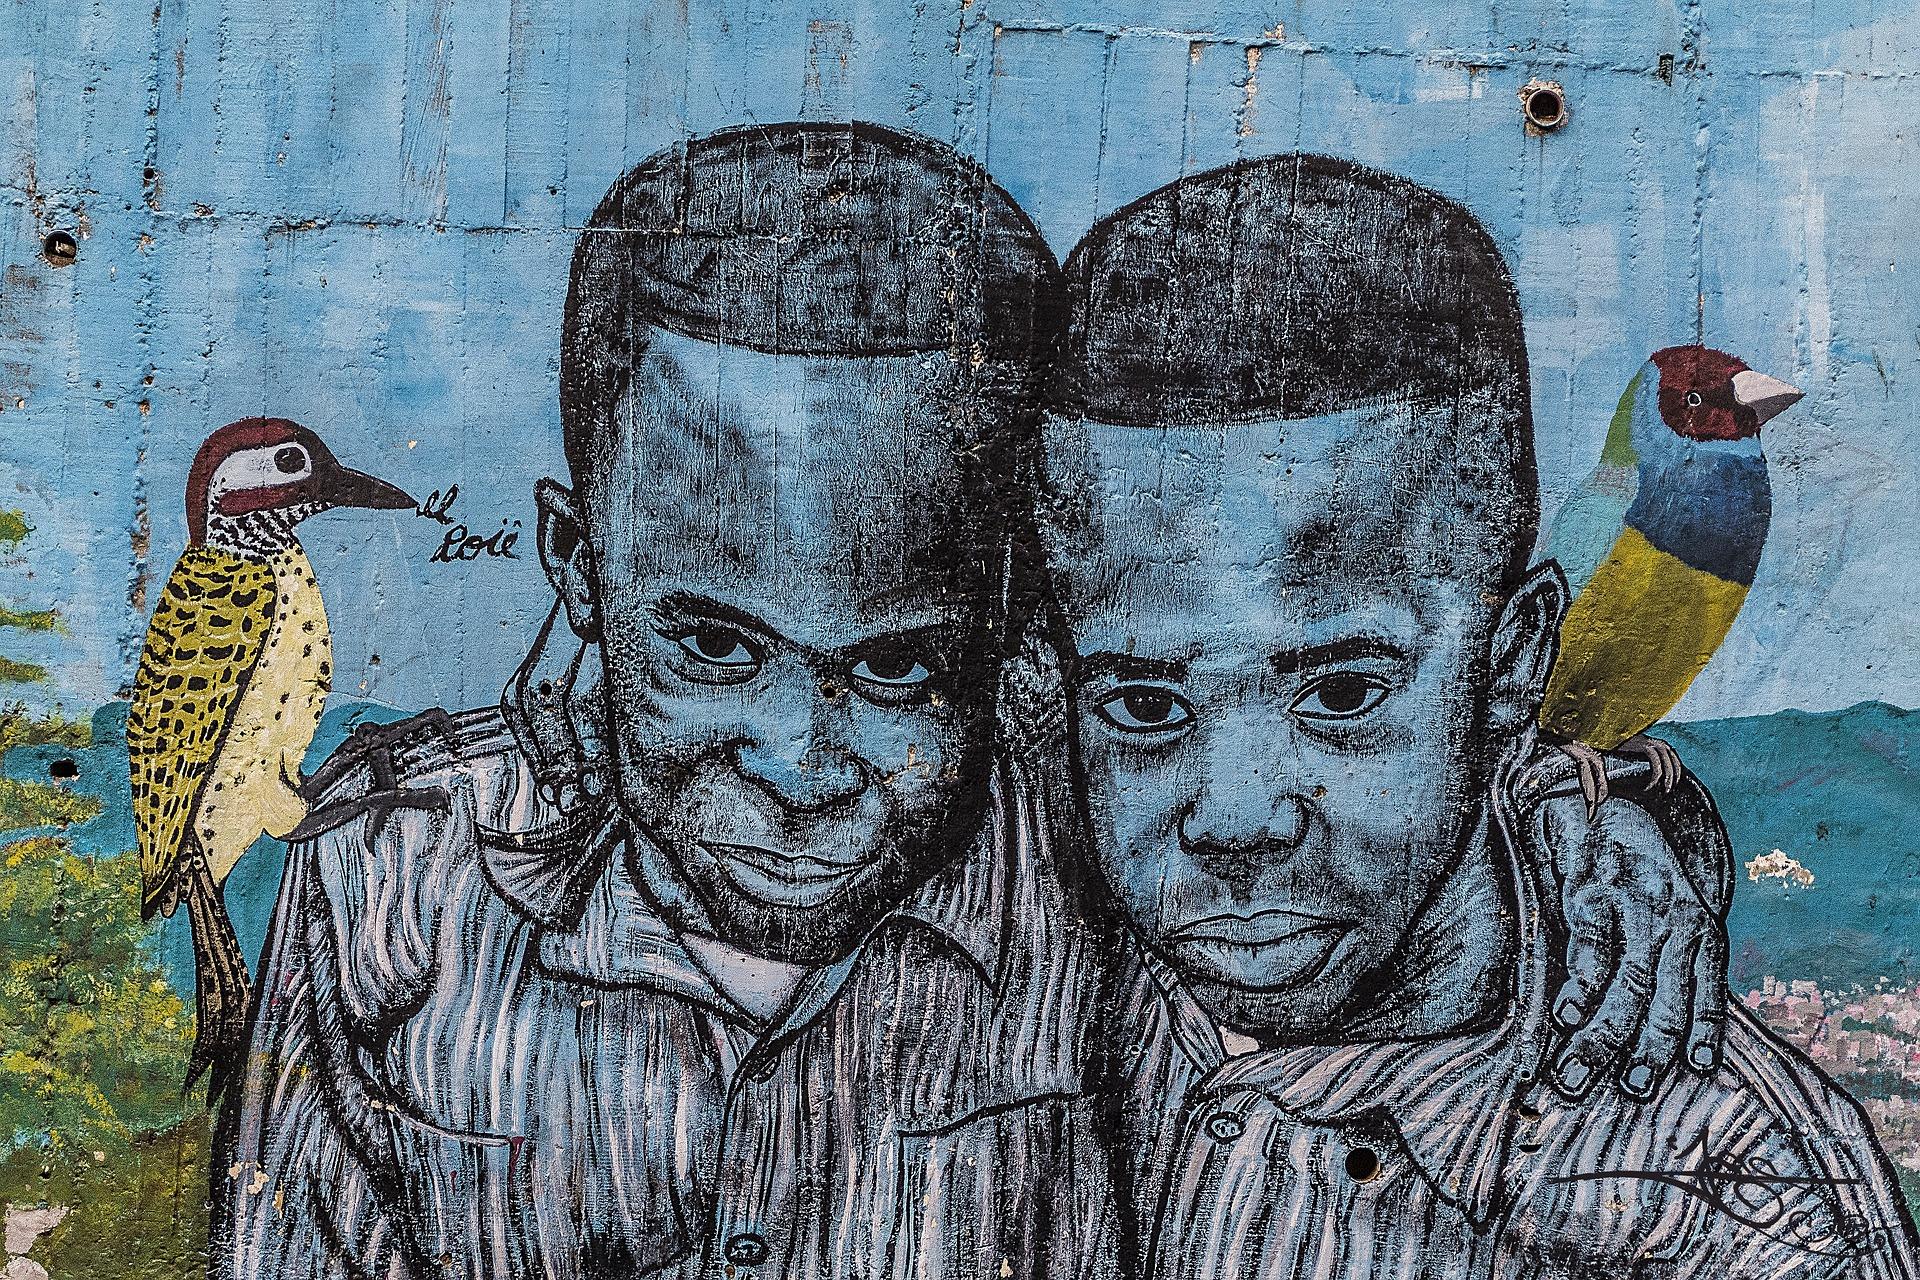 Street art, Medellin City Guide